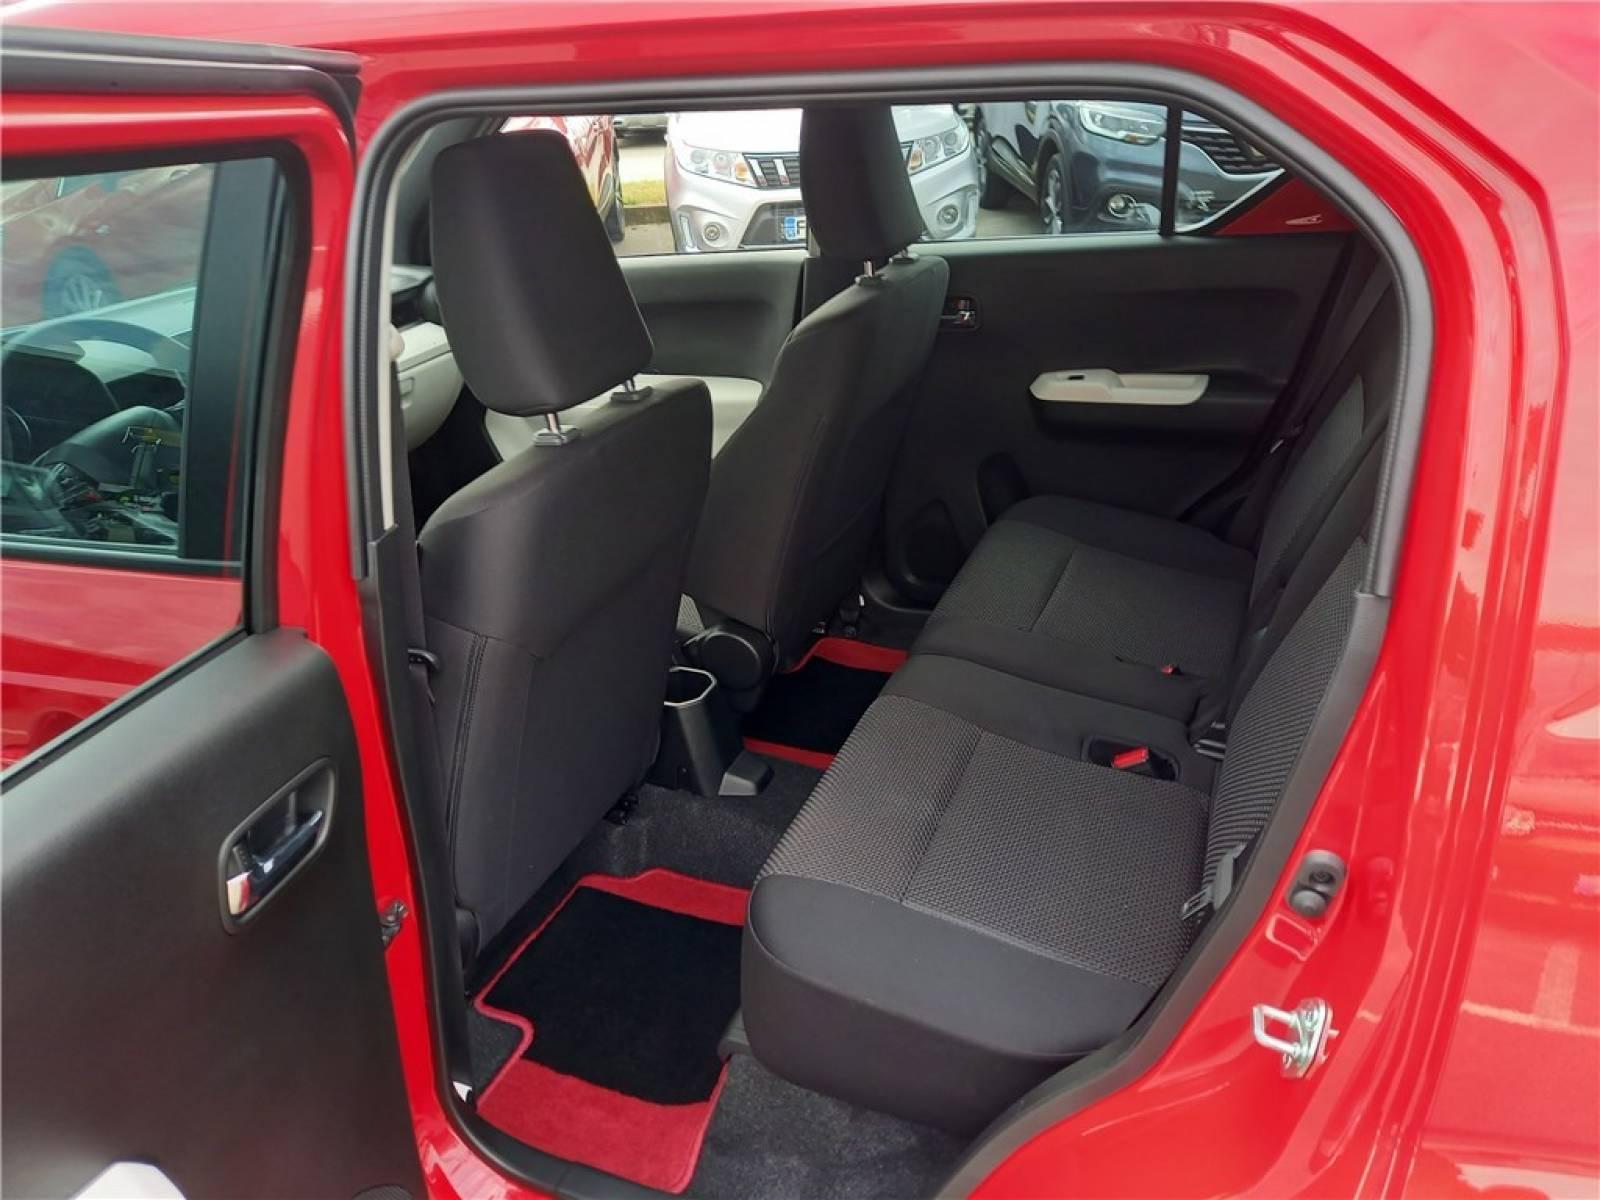 SUZUKI Ignis 1.2 Dualjet Auto (AGS) - véhicule d'occasion - Groupe Guillet - Opel Magicauto - Chalon-sur-Saône - 71380 - Saint-Marcel - 13